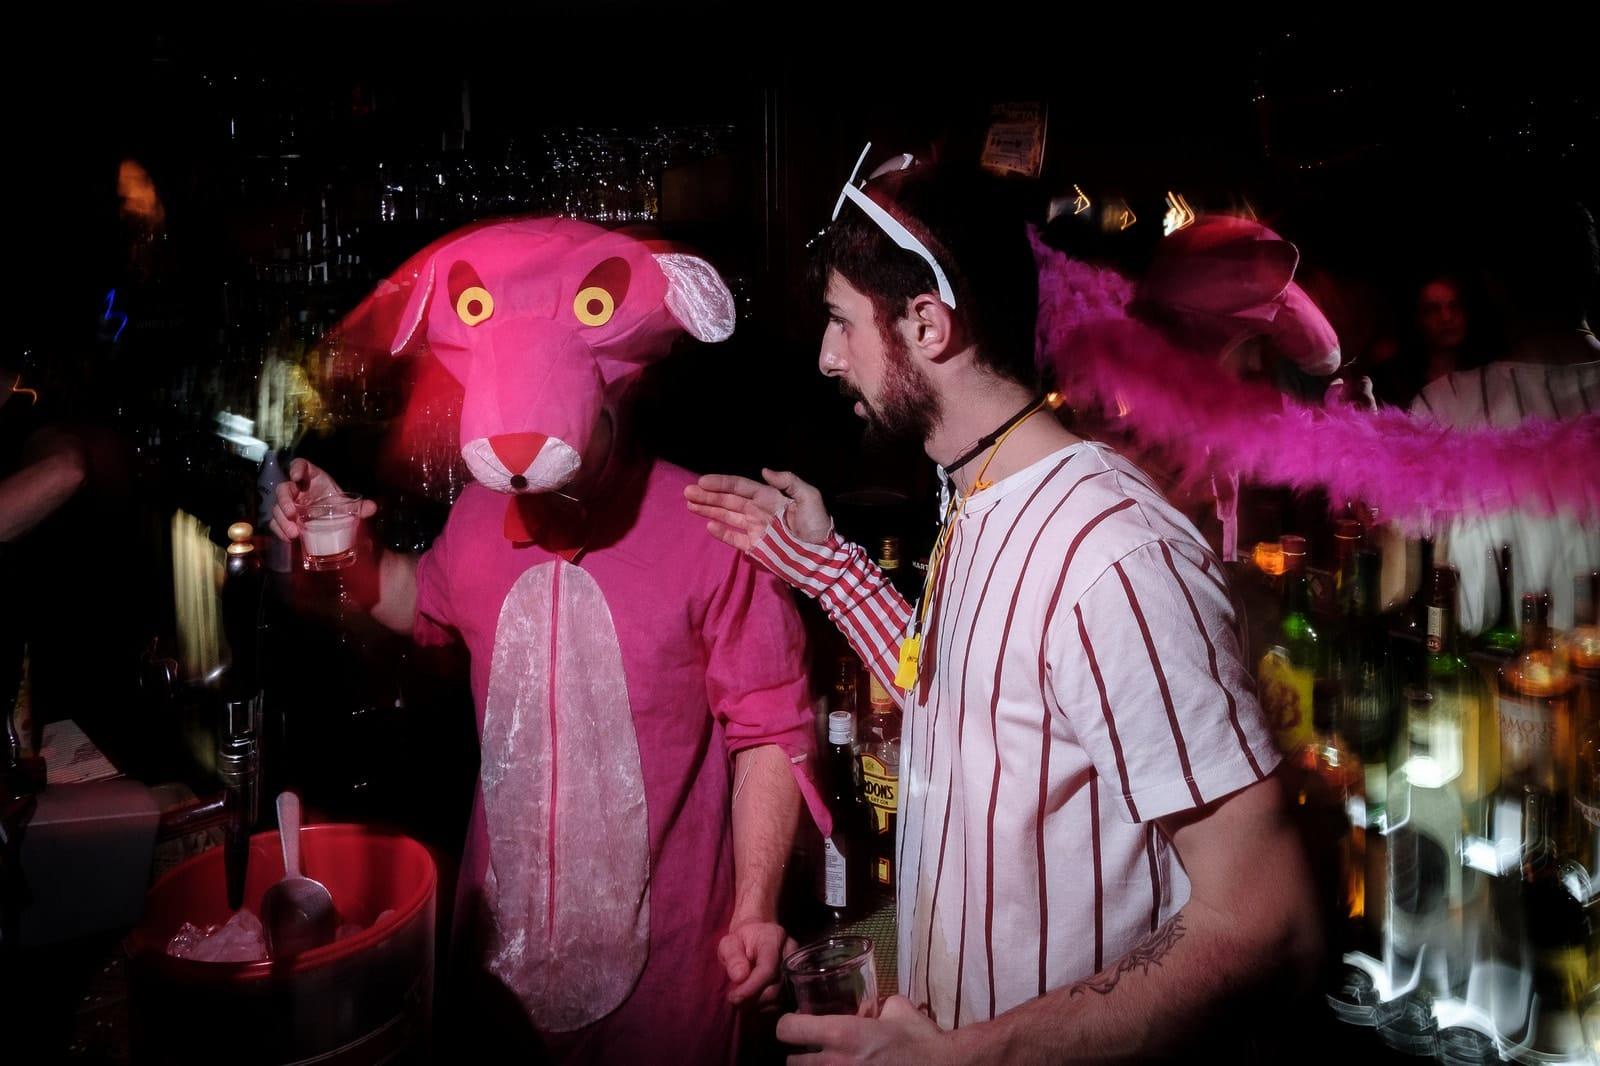 """Pink Panther"" by Spyros Papaspyropoulos"